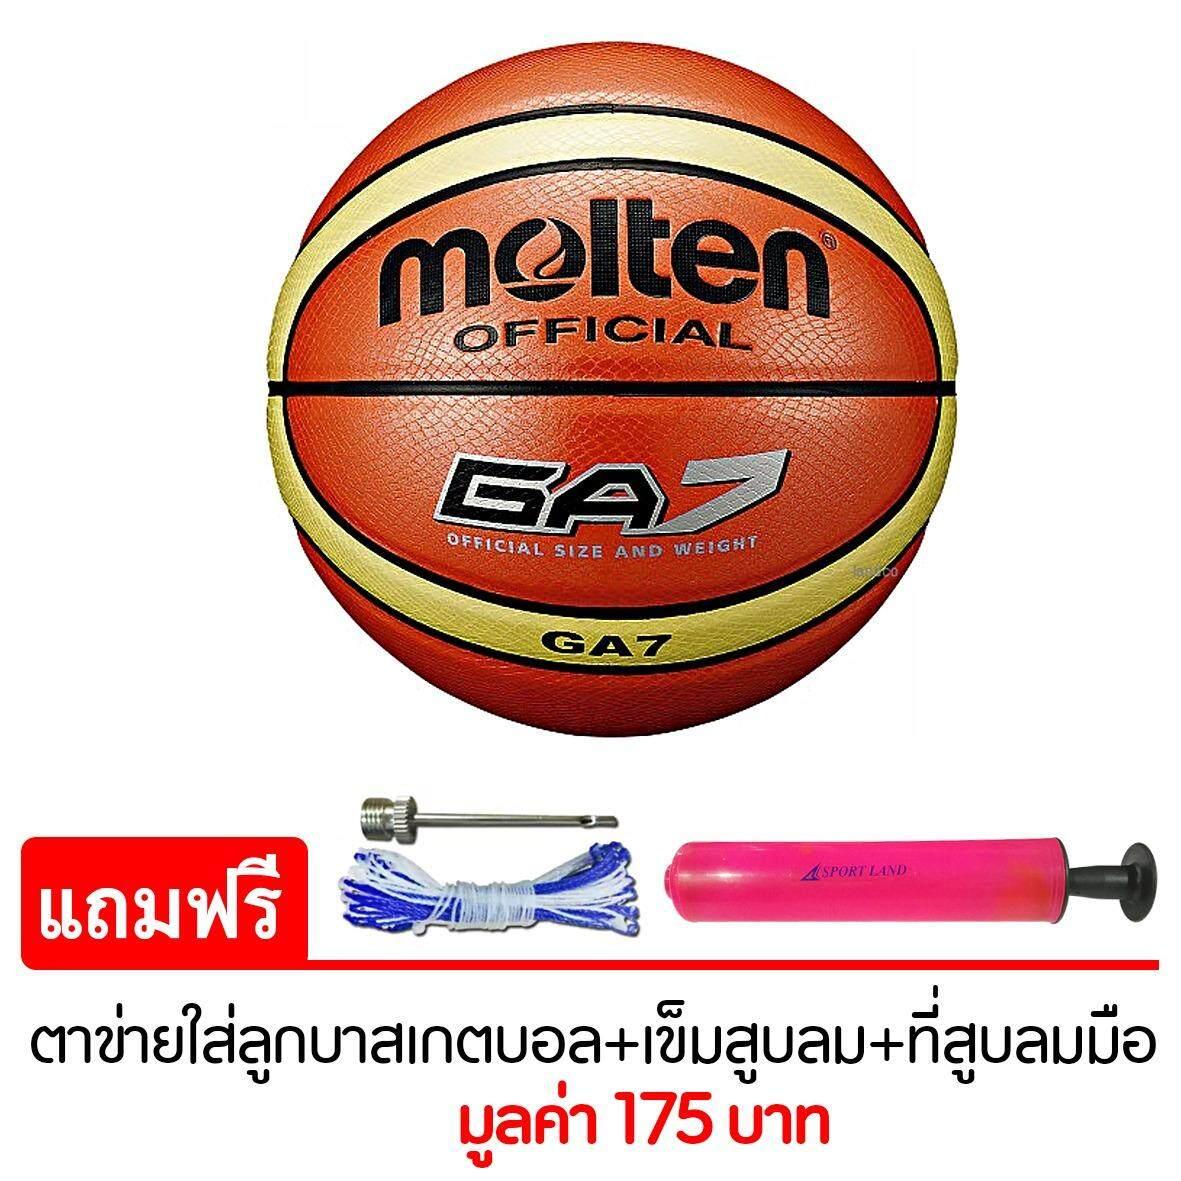 MOLTEN บาสเก็ตบอล Basketball PU MOT BGA7 เบอร์7 แถมฟรี ตาข่ายใส่ลูกบาสเกตบอล + เข็มสูบสูบลม + สูบมือ SPL รุ่น SL6 สีชมพู